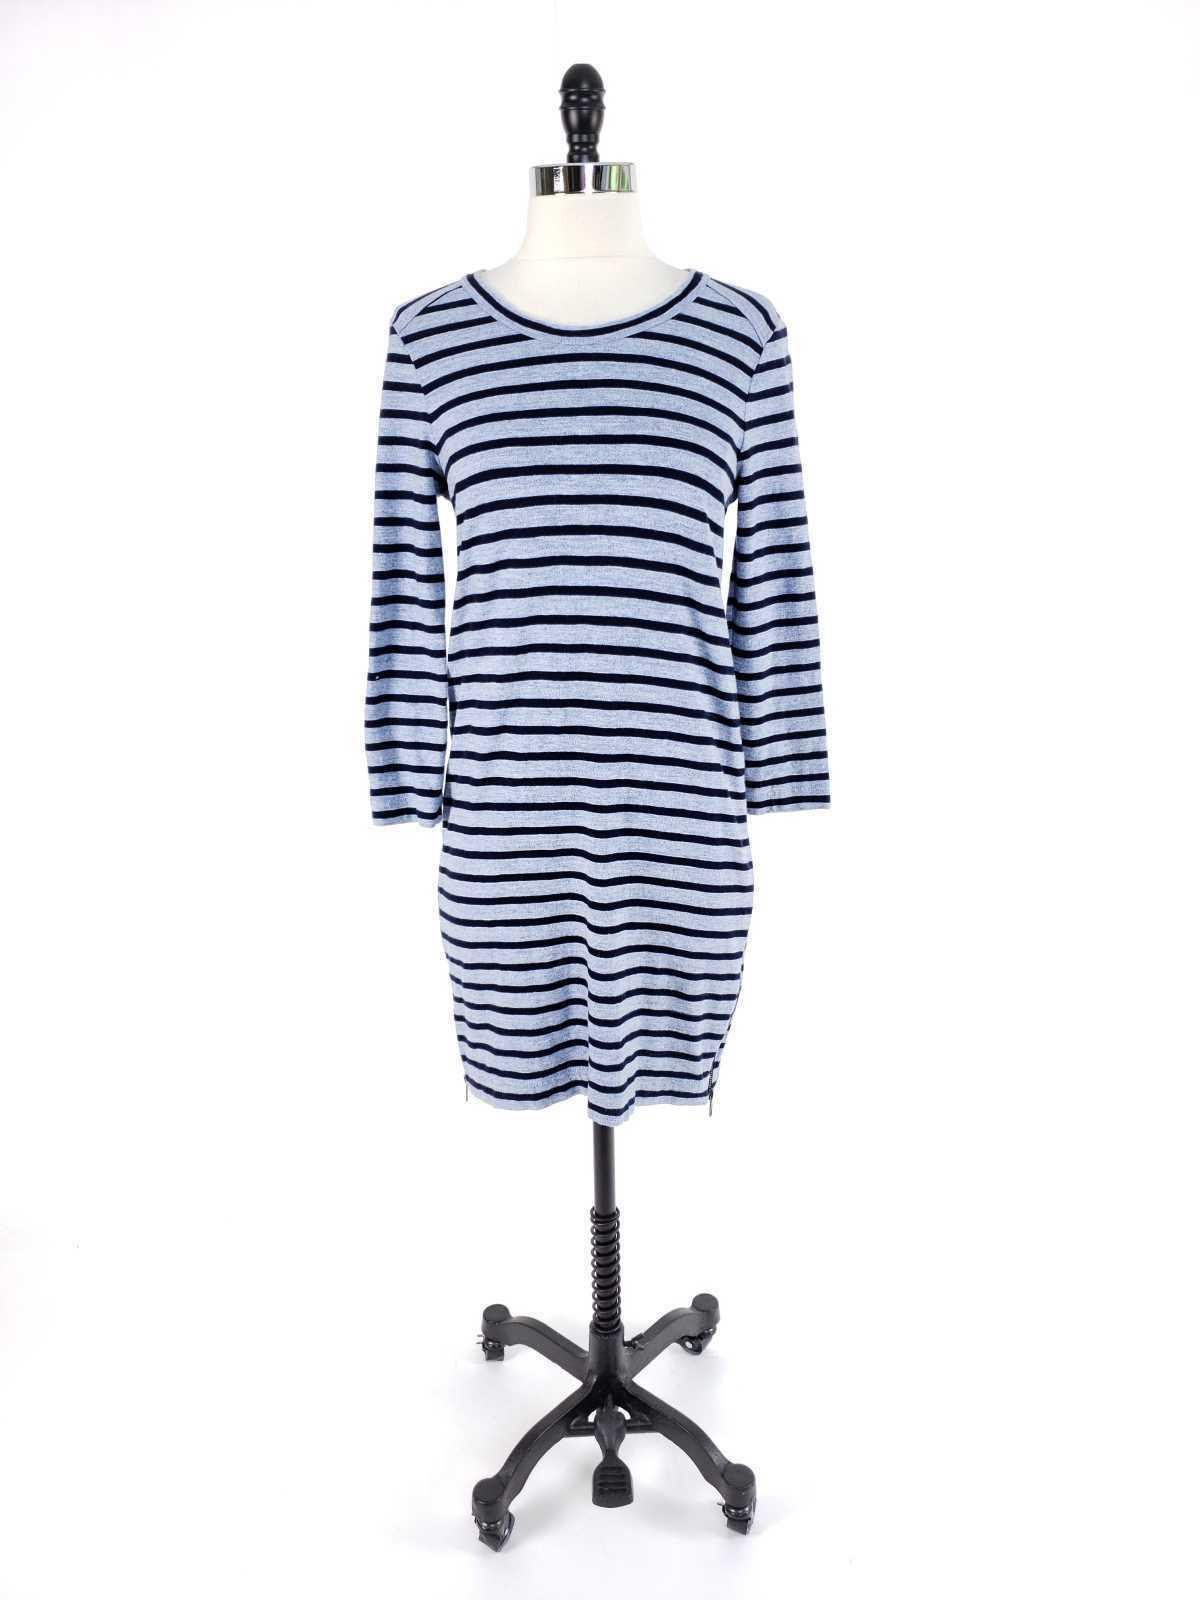 J.Crew Women XS Dress Striped Side Zip Tshirt Cotton Long Sleeve Casual